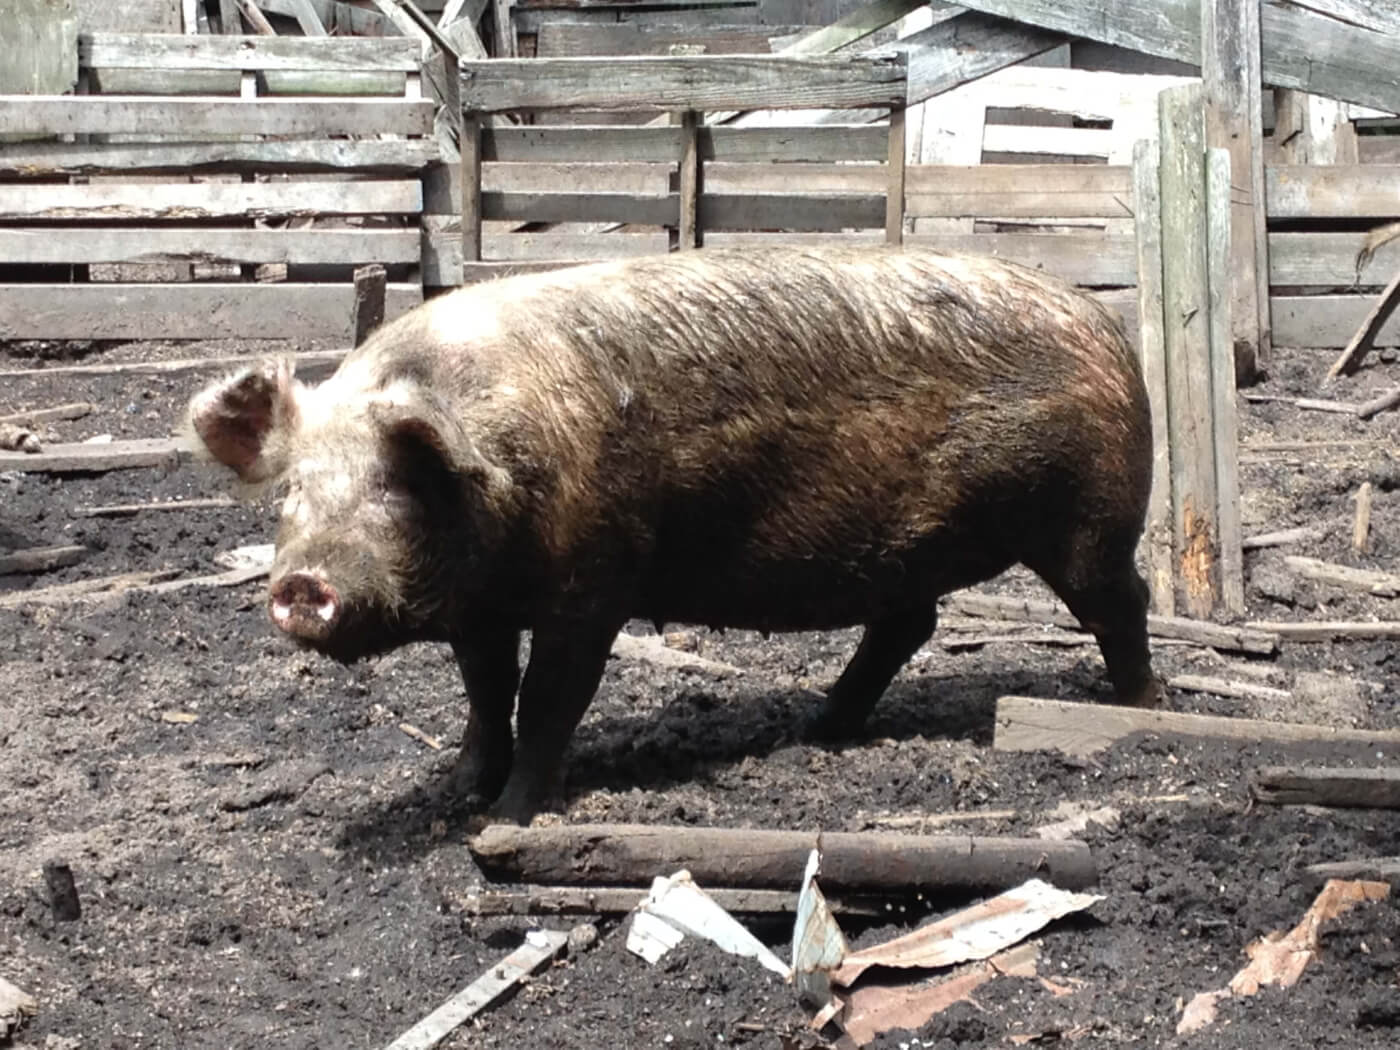 Report Cruelty to Animals | PETA